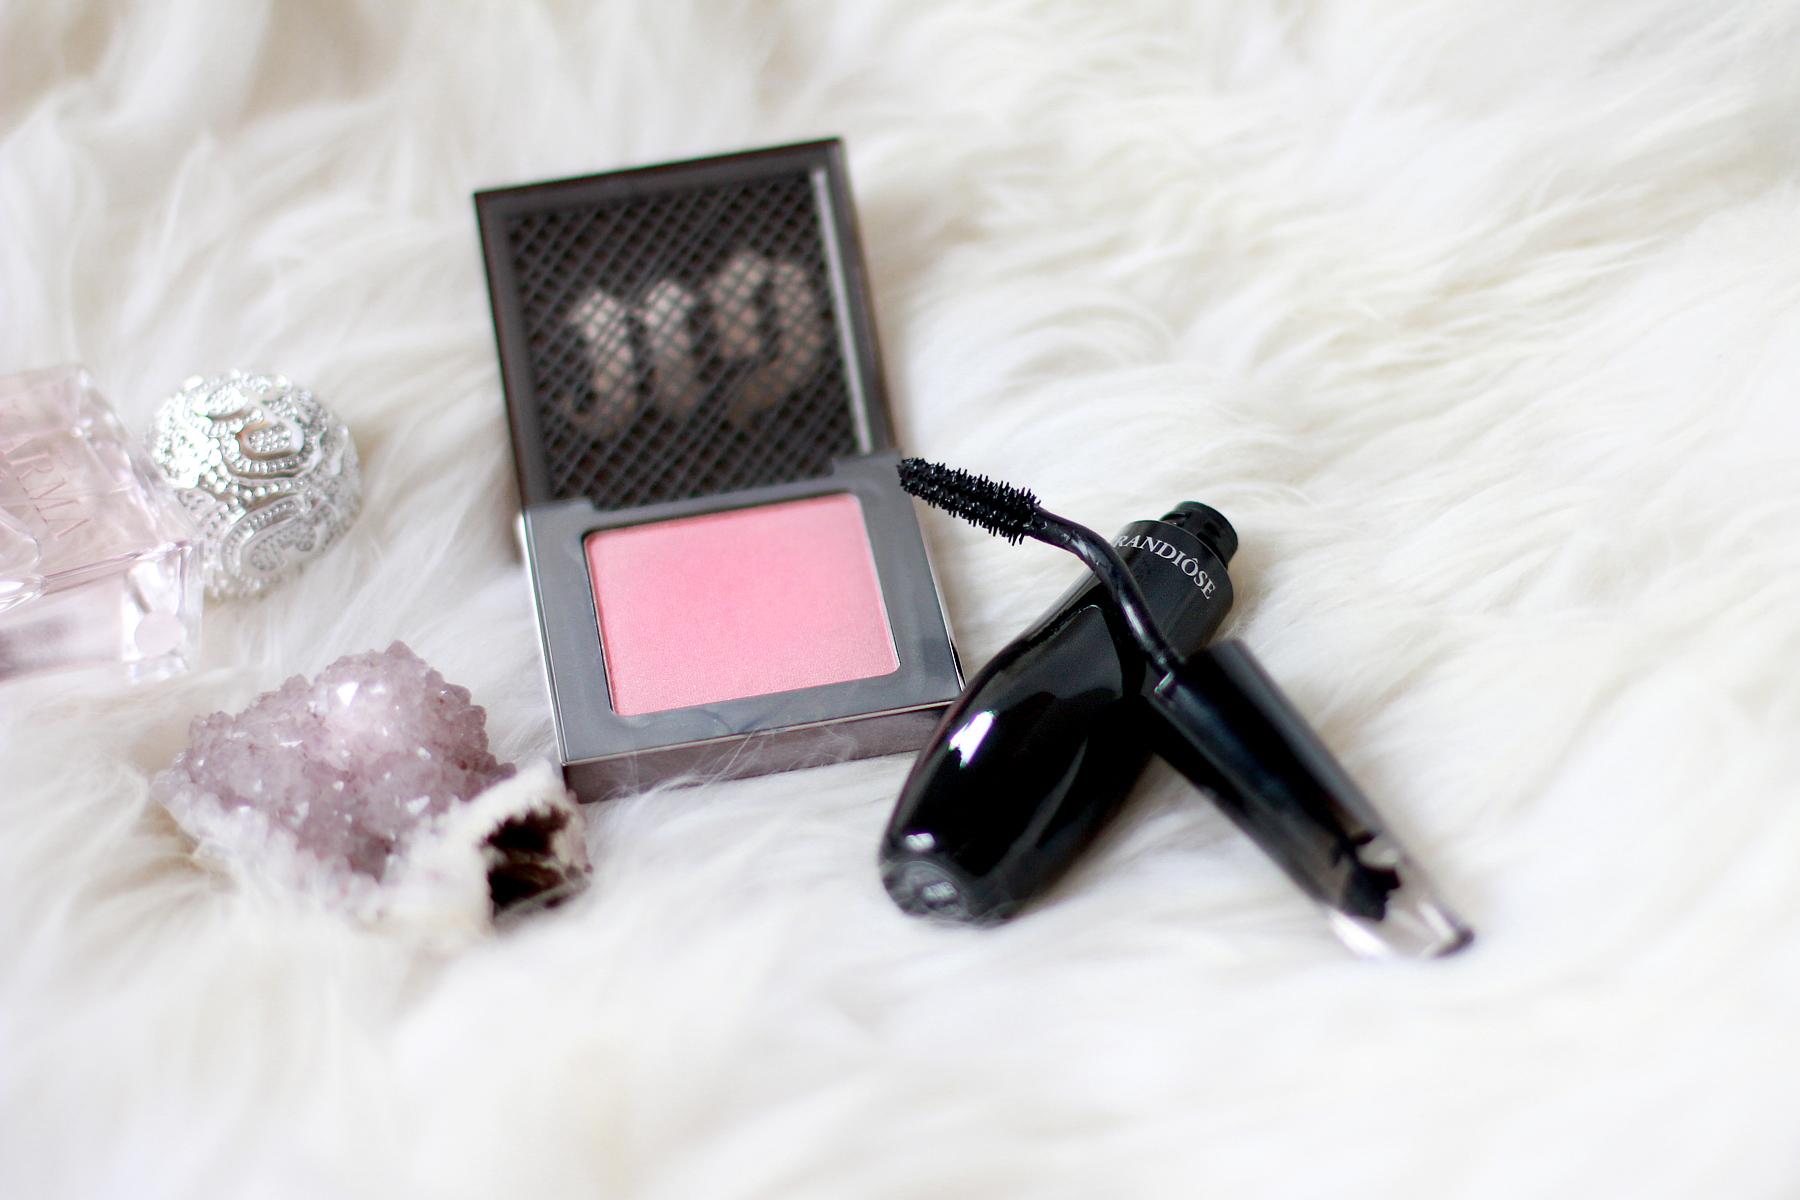 beauty favourites october urban decay alessandro lancôme clarisonic shiseido shopping makeup beautyblogger fashionblogger germany ricarda schernus blog cats & dogs berlin düsseldorf hannover 1